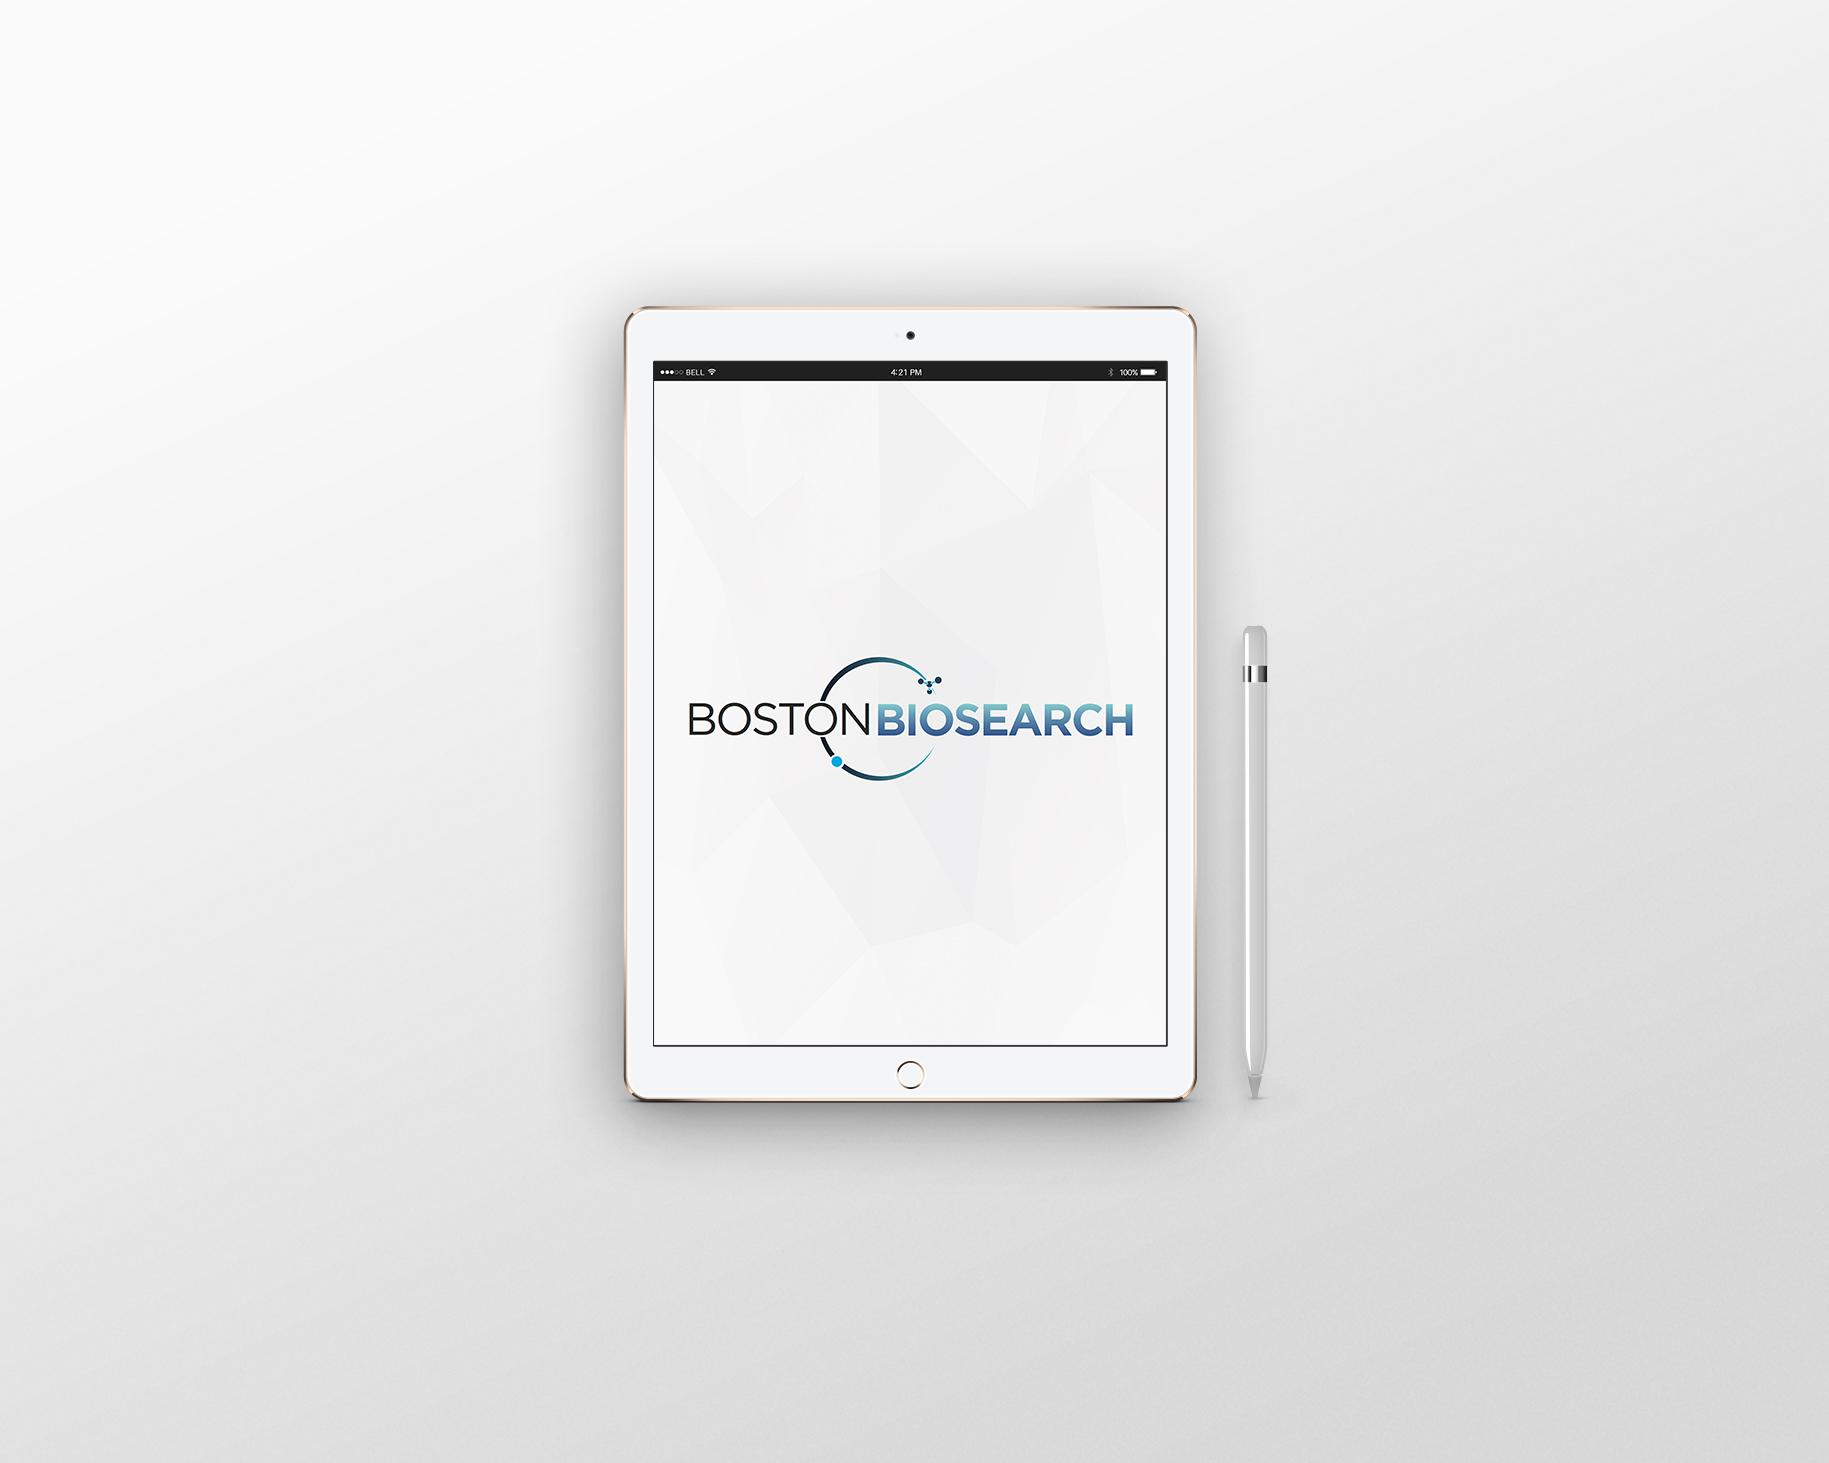 Medical Research Logo Design Services